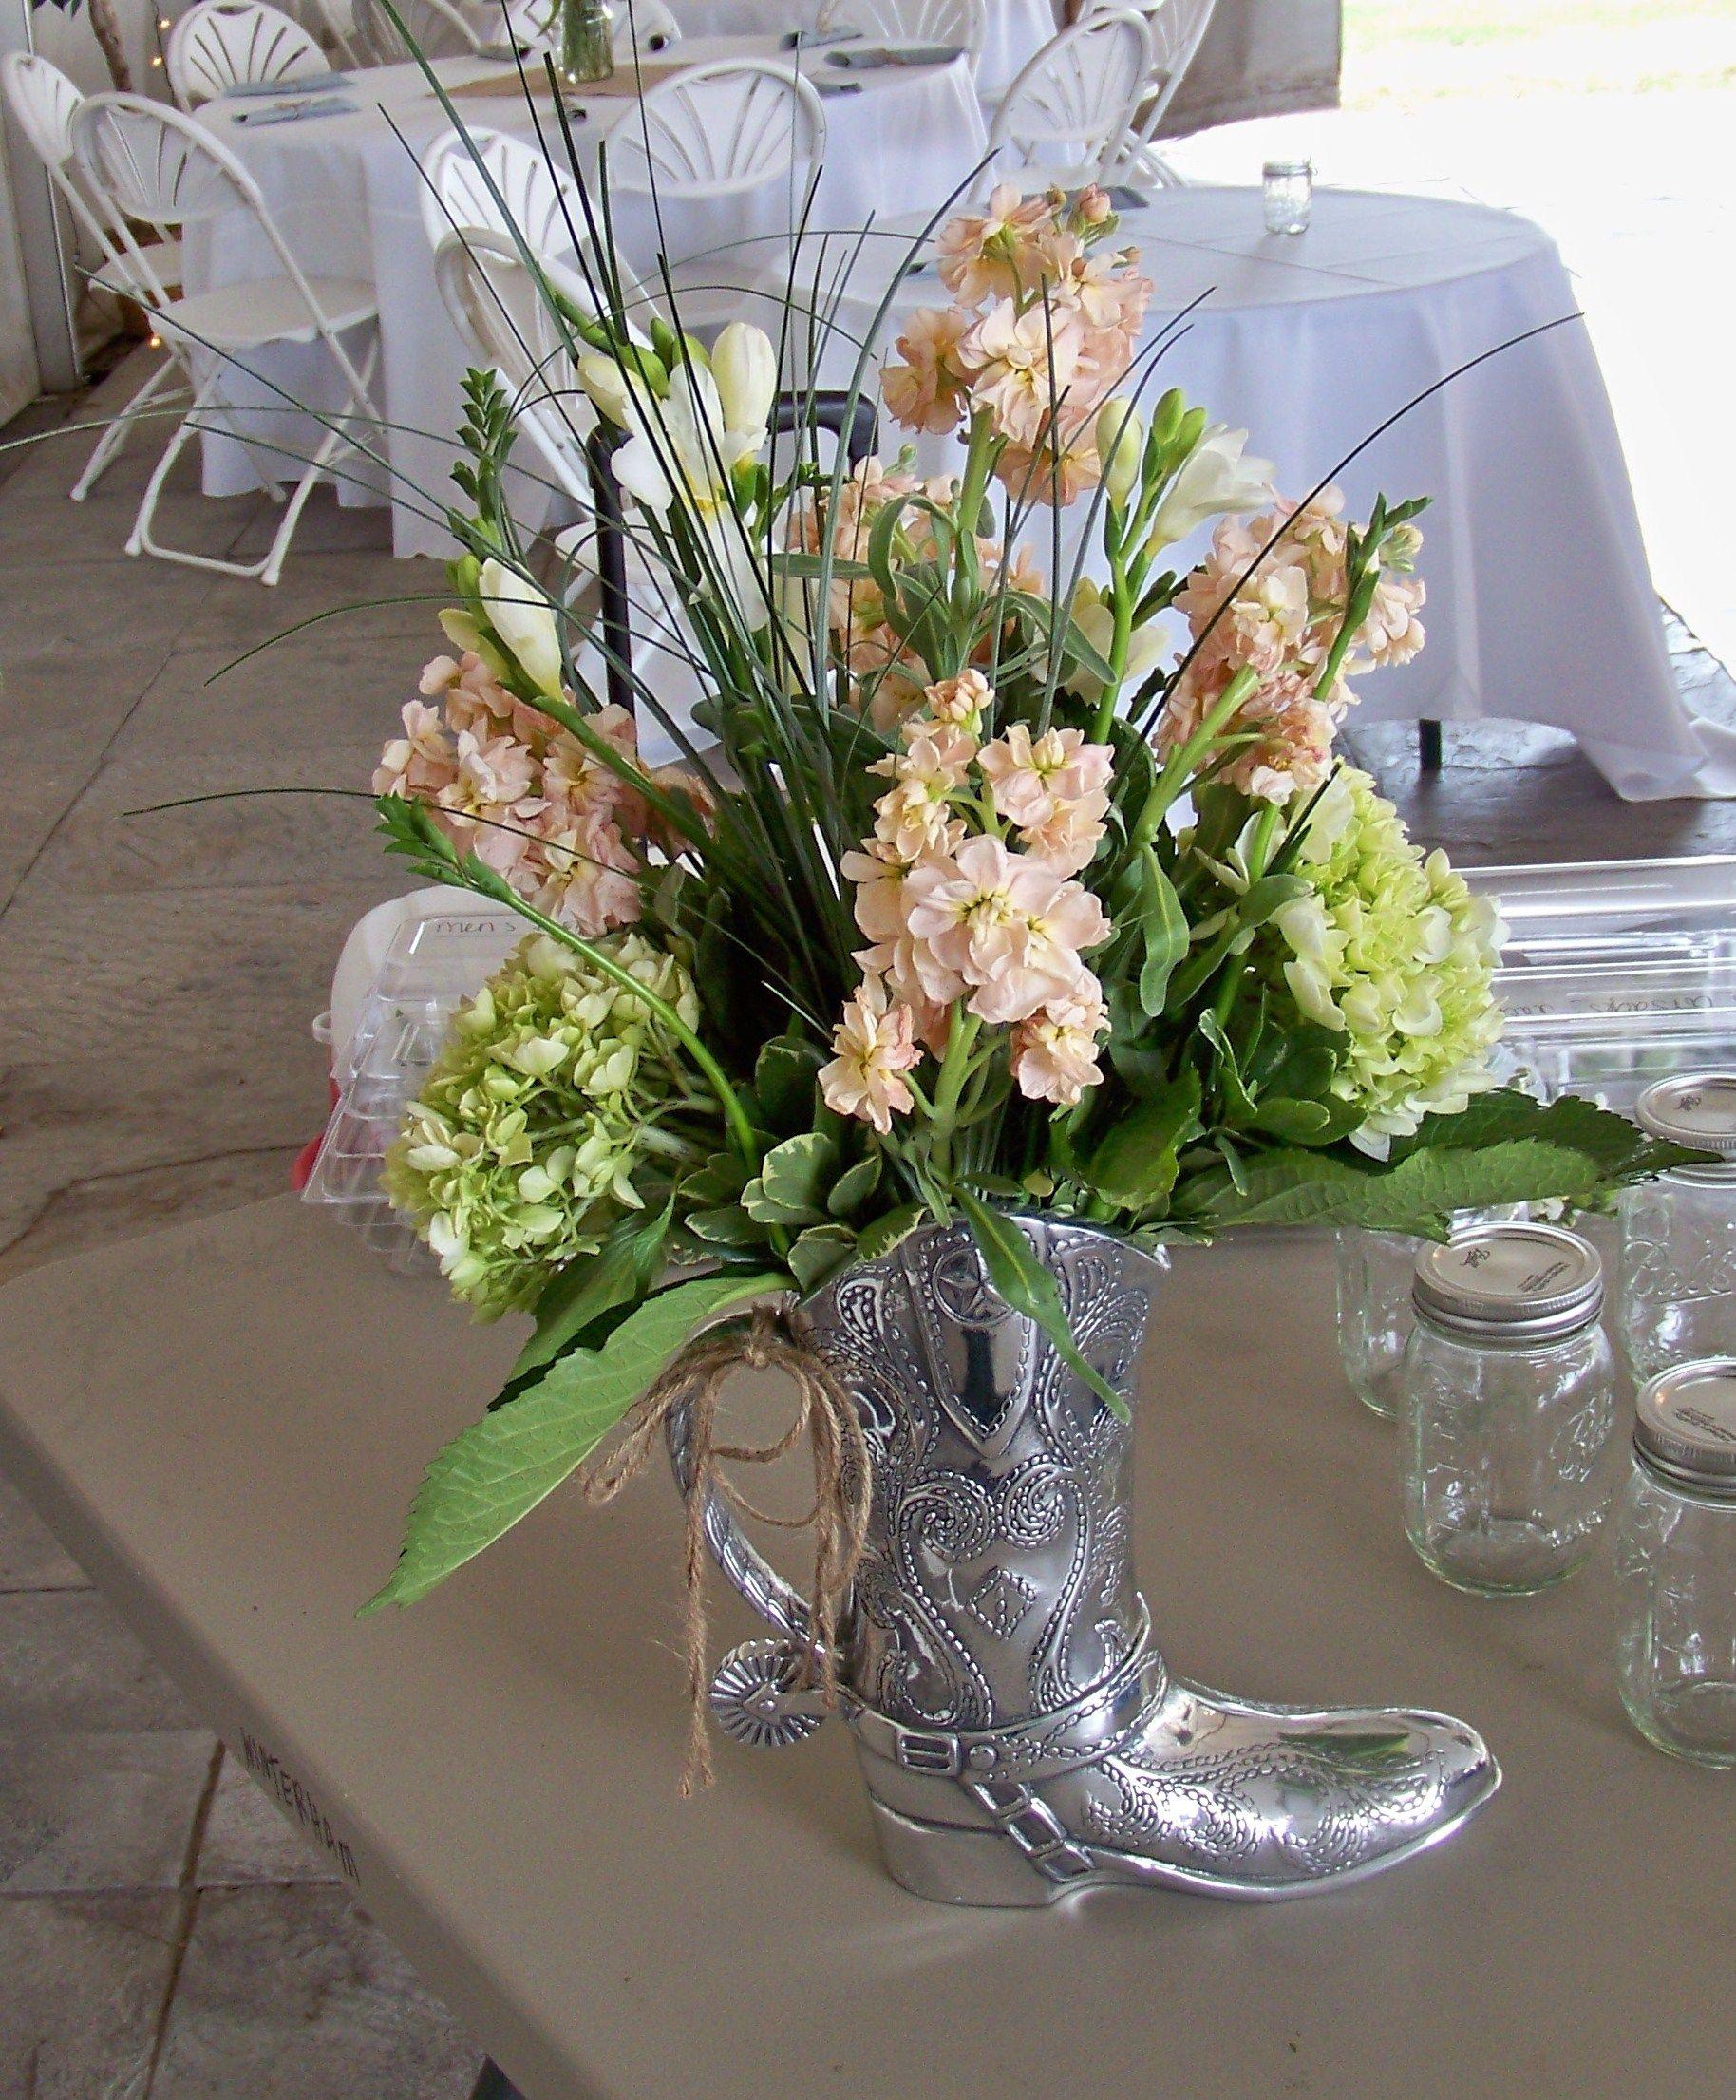 Pewter cowboy boot vase my wedding creations pinterest pewter cowboy boot vase floridaeventfo Images